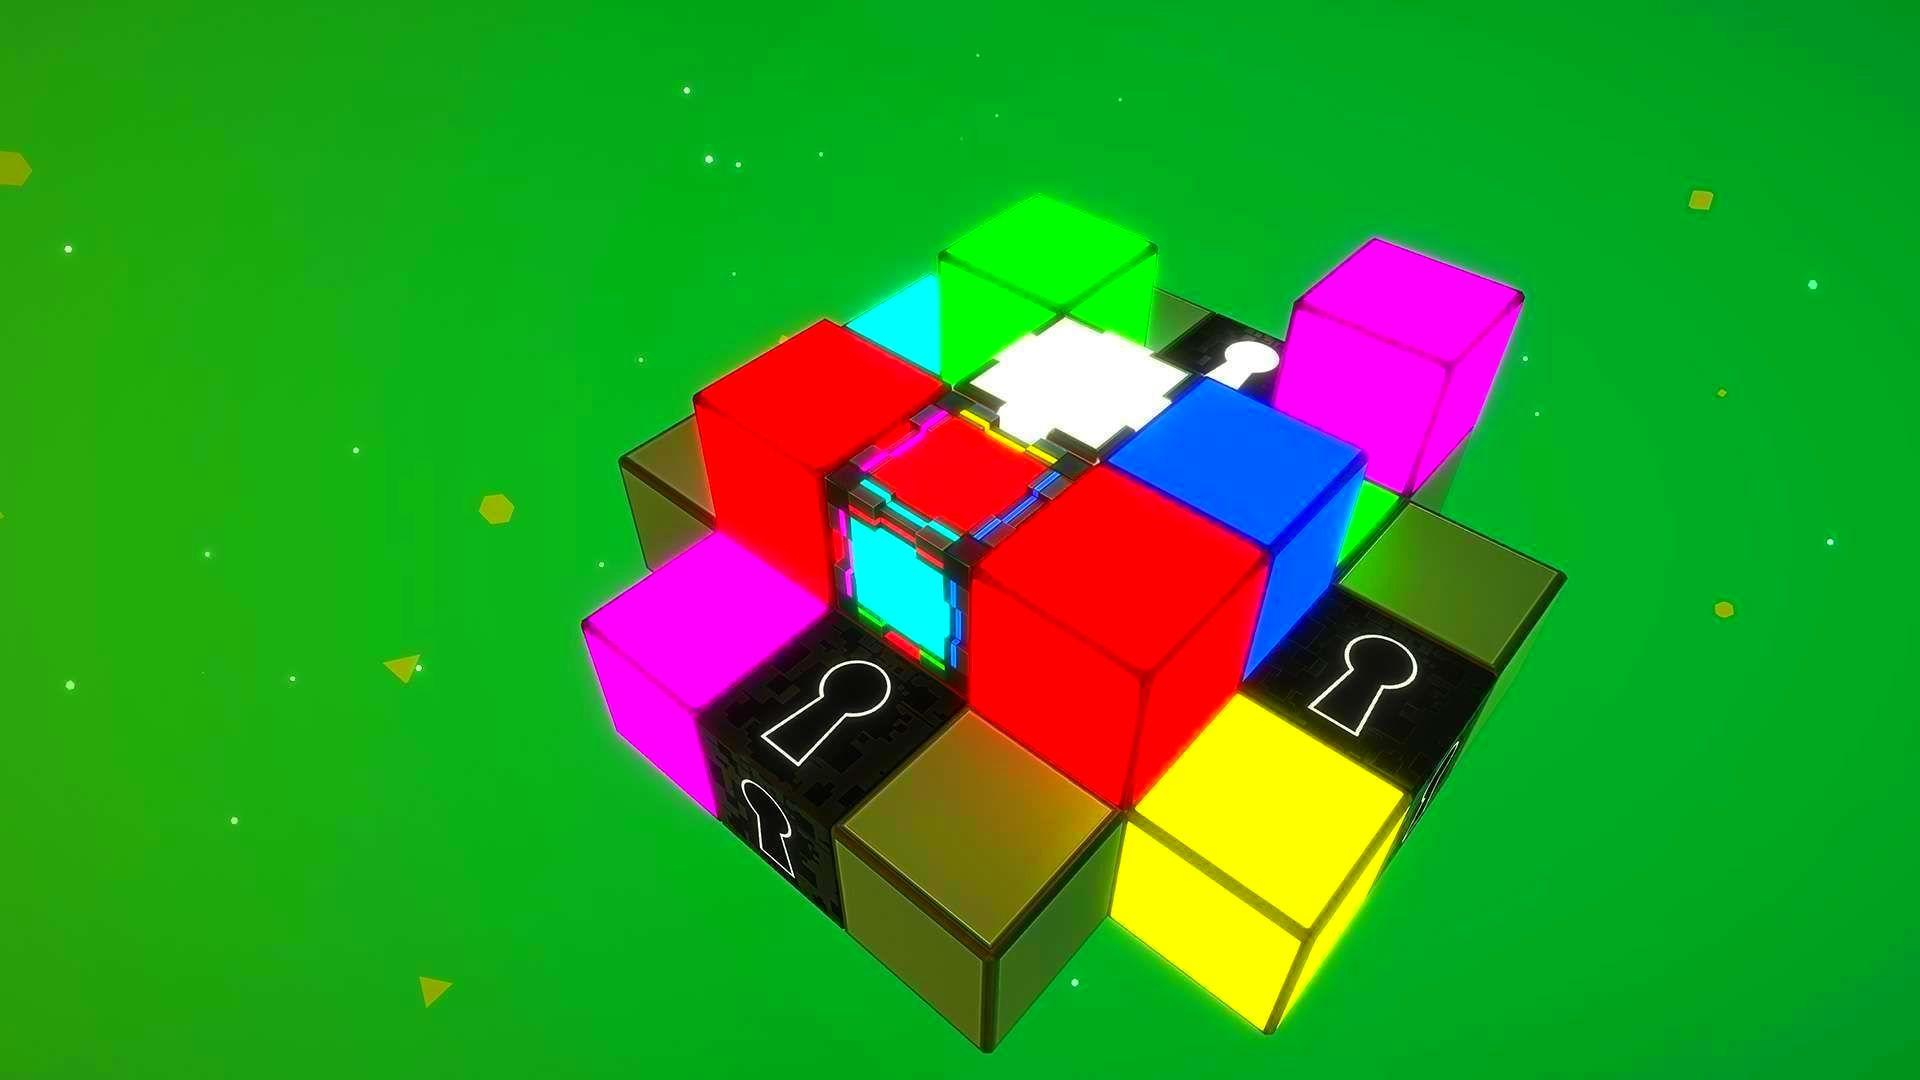 fractalbox_cubikolor_screen_07.jpg